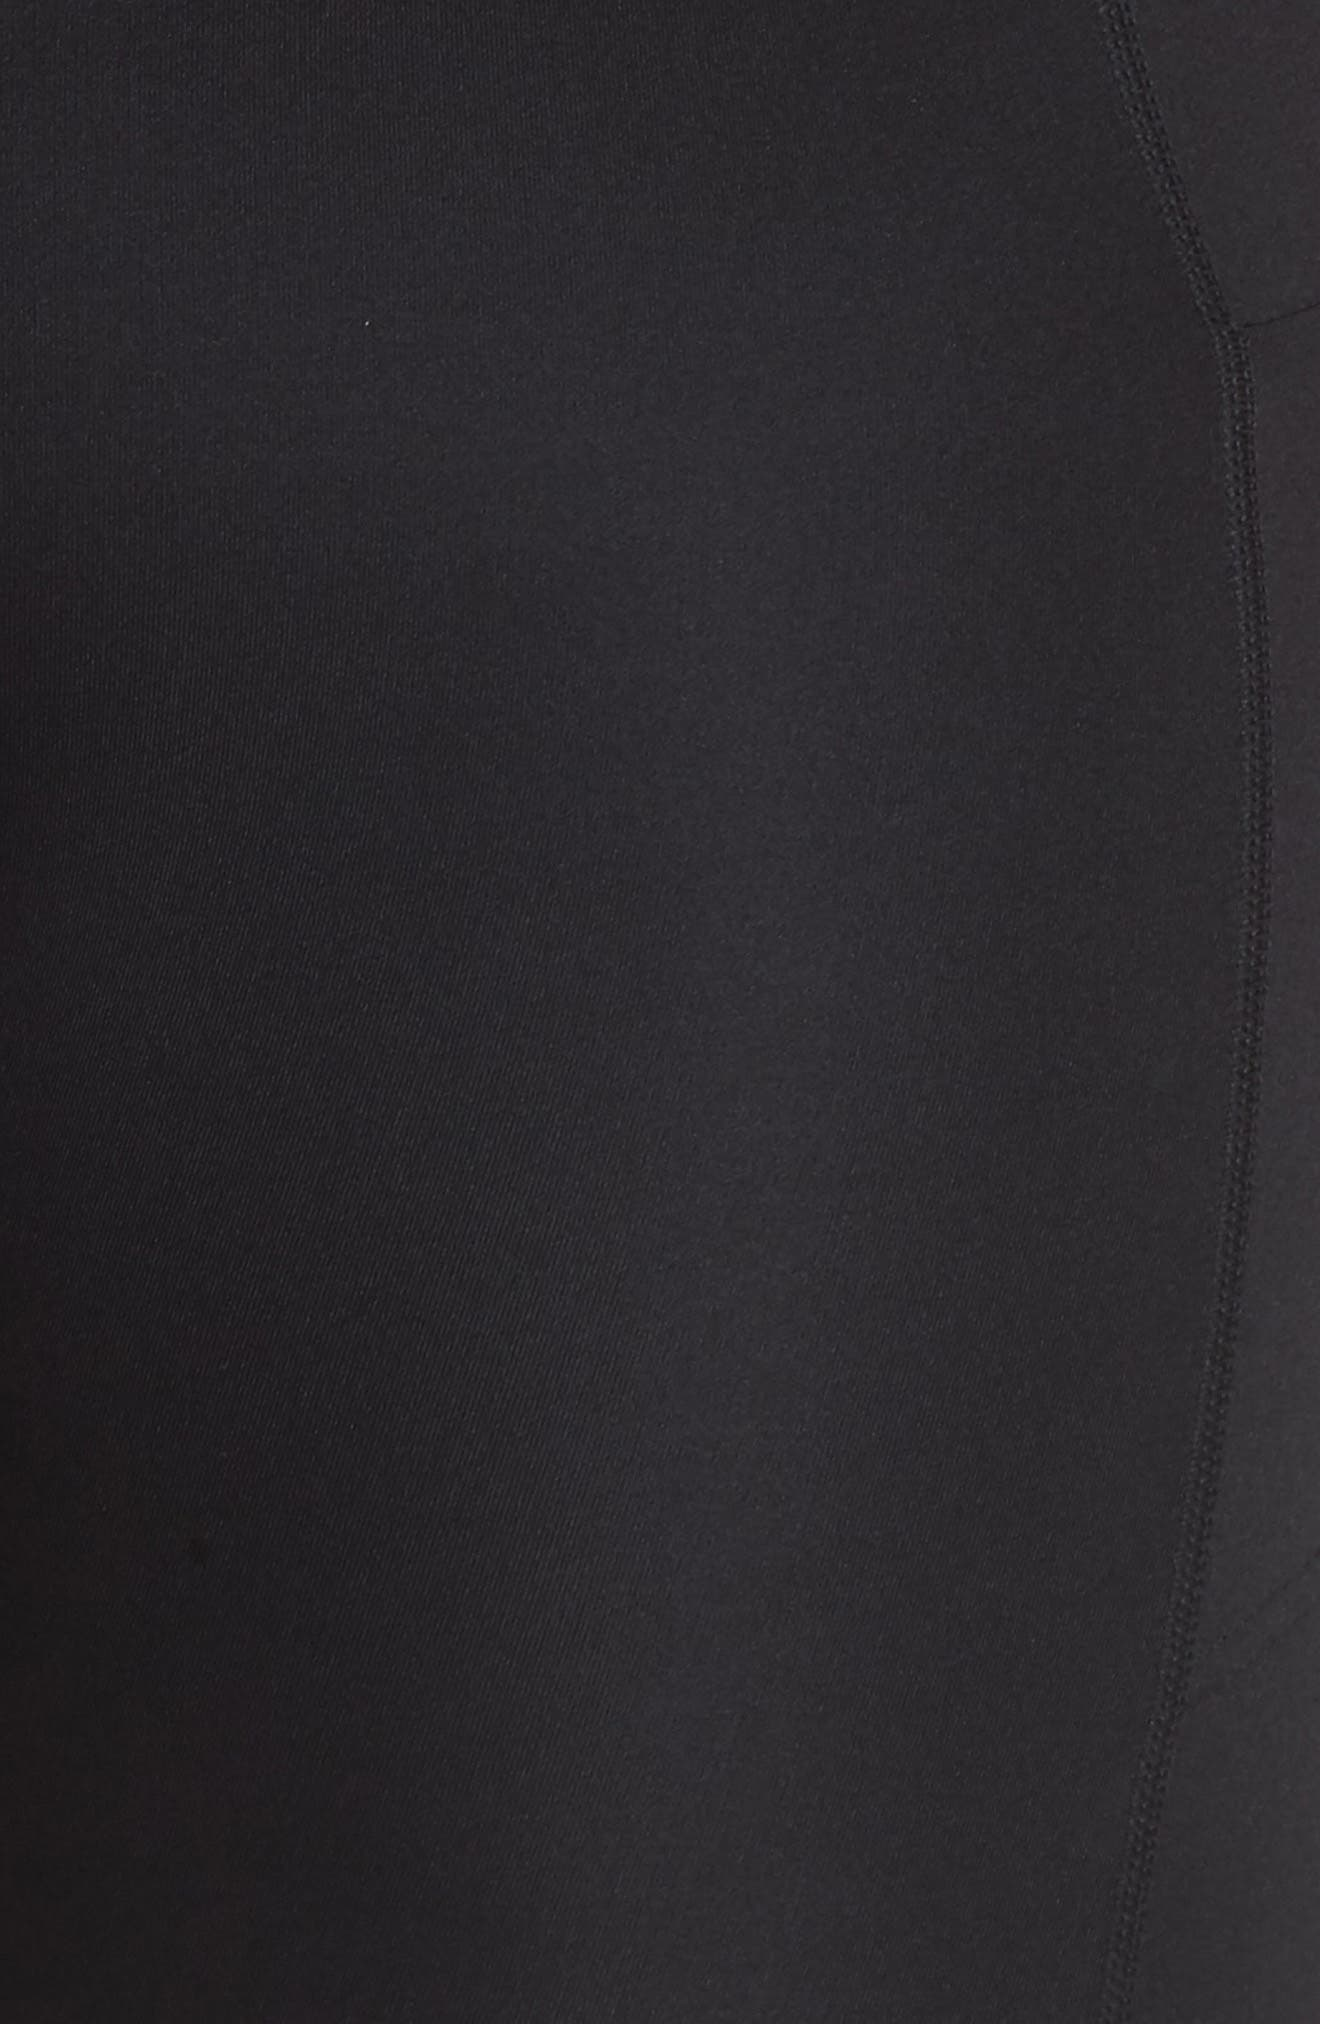 High Waist Run Sprint In Crop Leggings,                             Alternate thumbnail 12, color,                             BLACK